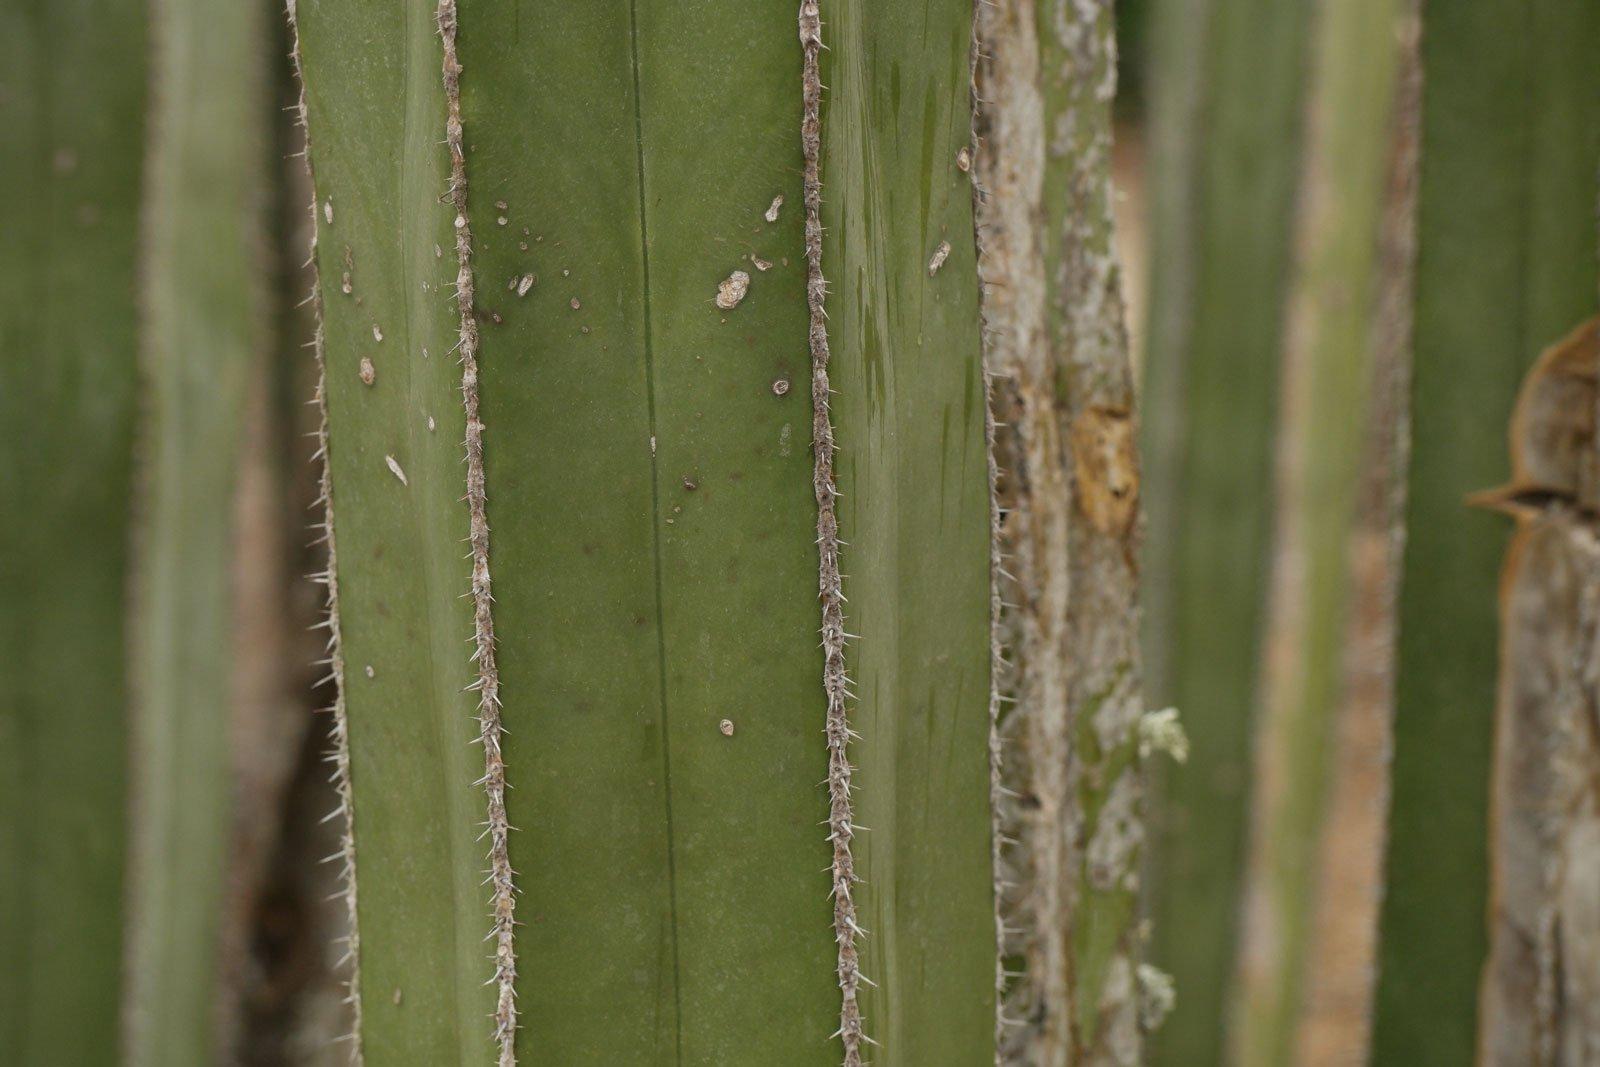 Pachycereus marginatus